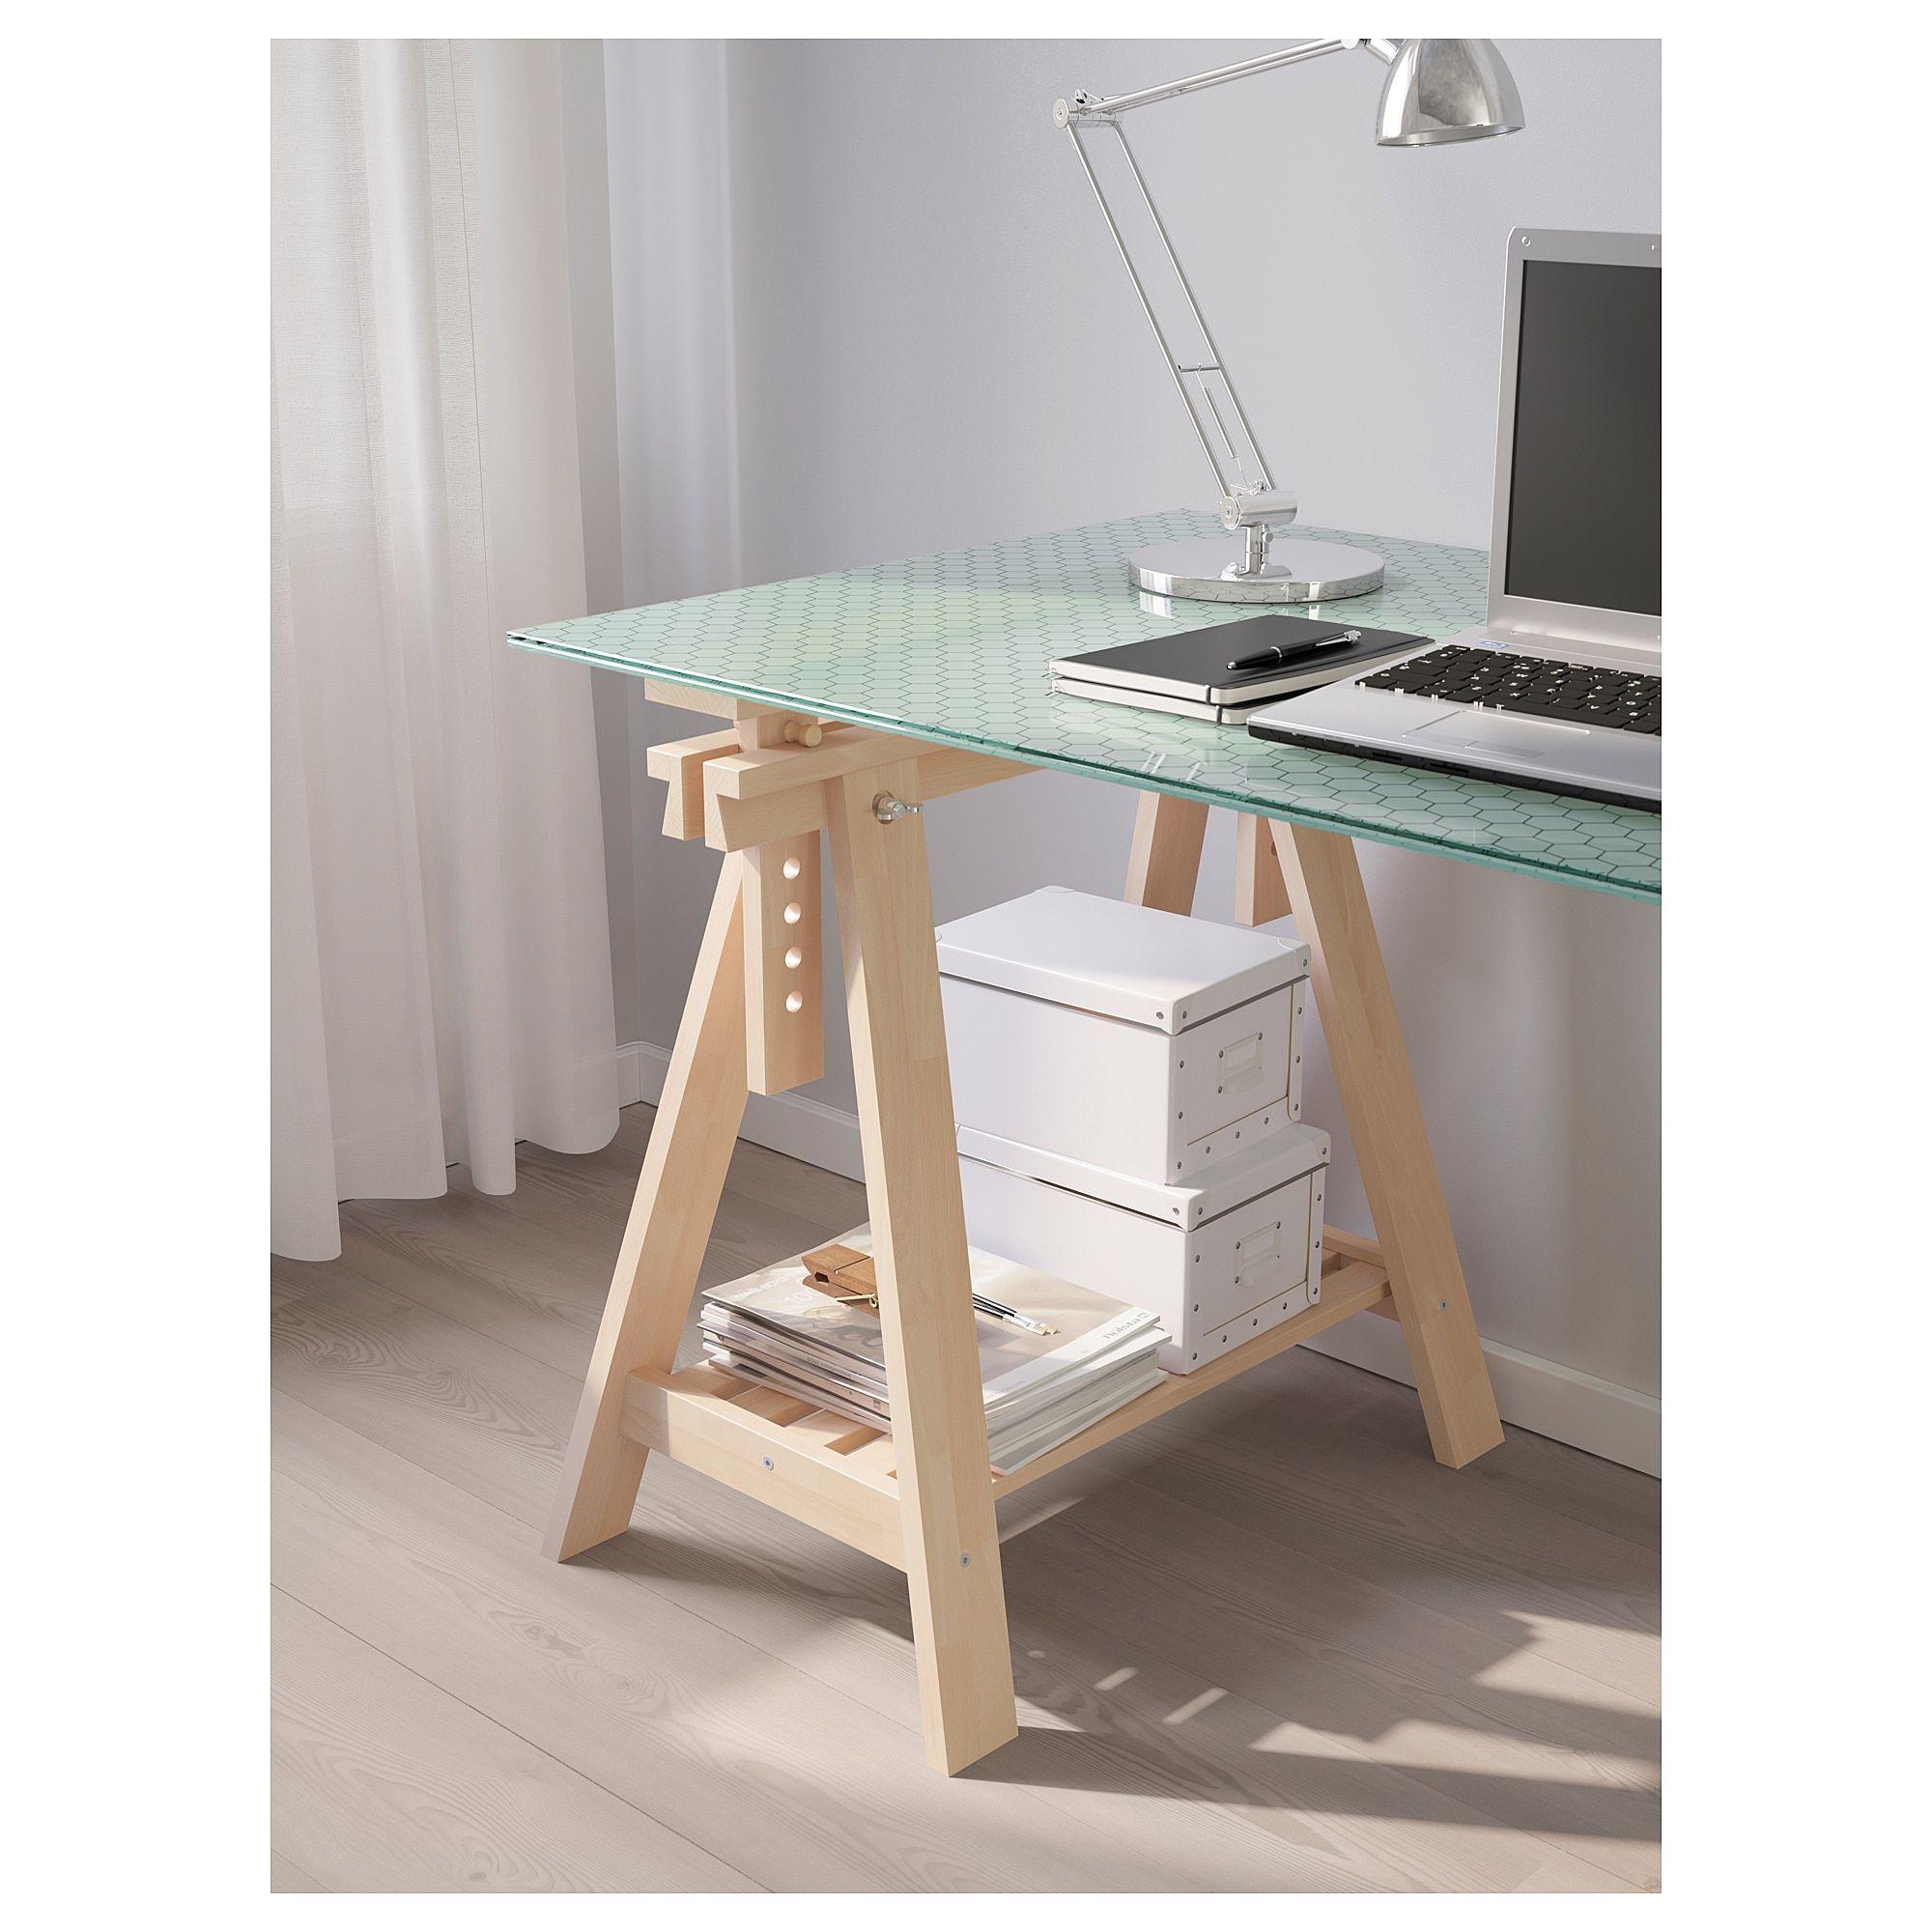 Furniture Home Furnishings Find Your Inspiration Unique Furniture Design Bedroom Redesign Honeycomb Pattern